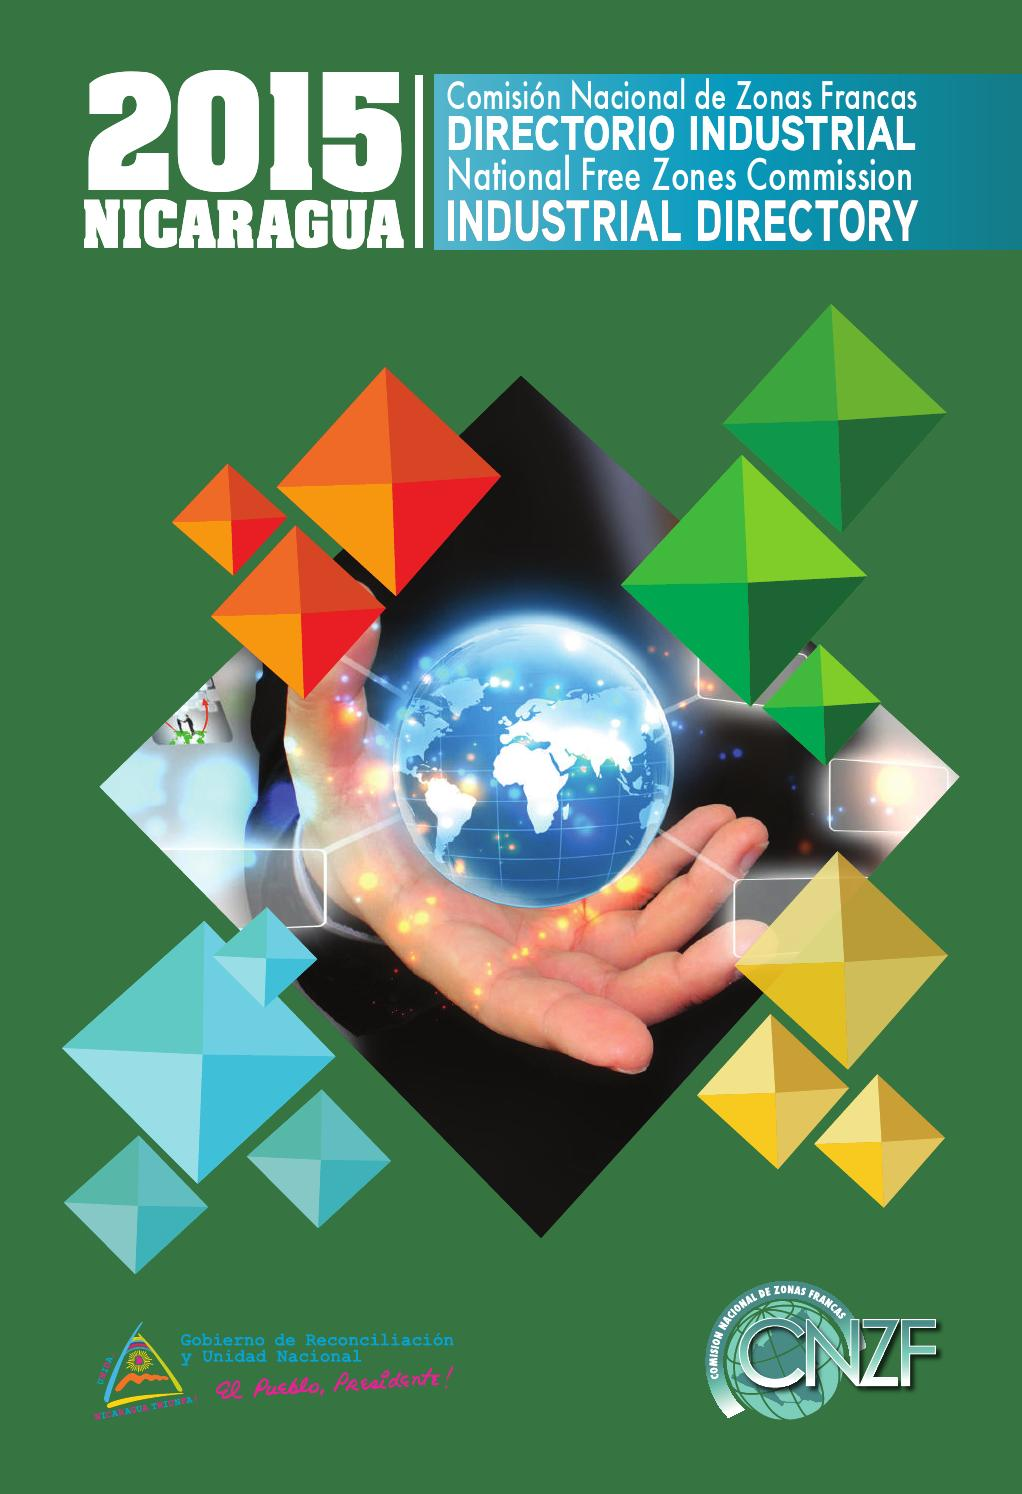 Directorio Industrial 2015 By Comision Nacional De Zonas Francas  # Muebles Sequeira Plasencia